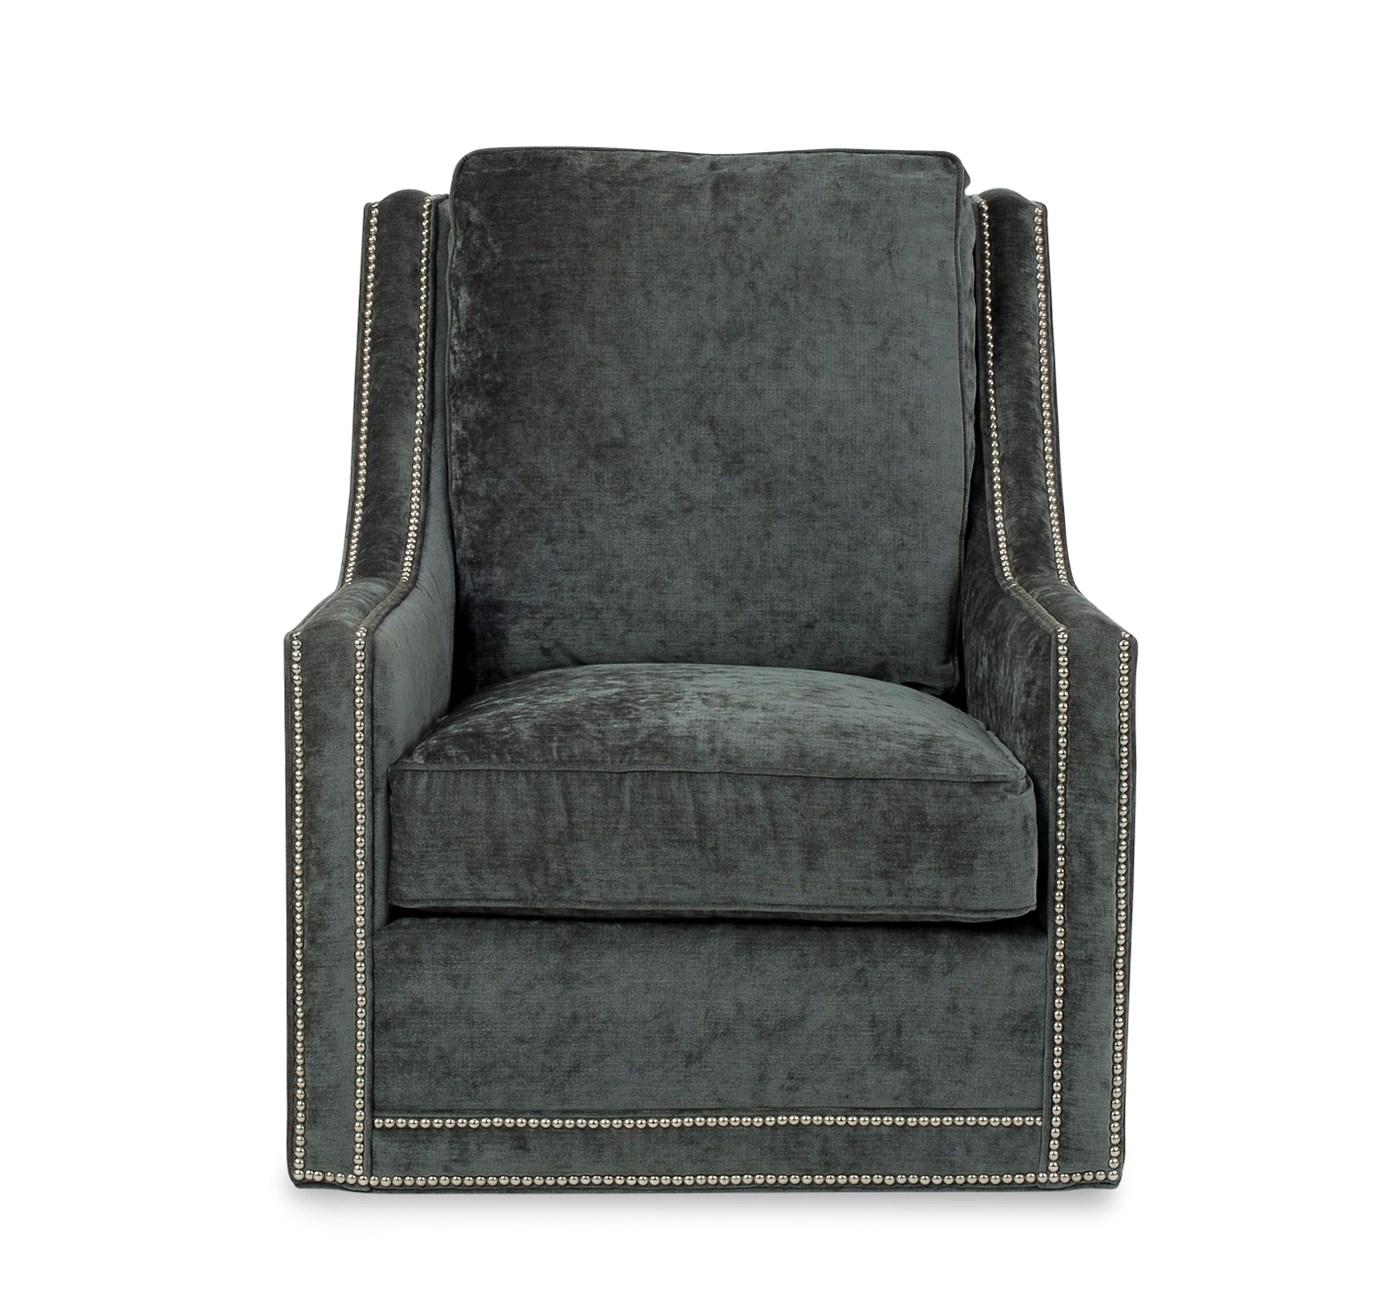 Larsen Swivel Chair Chairs Chaises Living Room